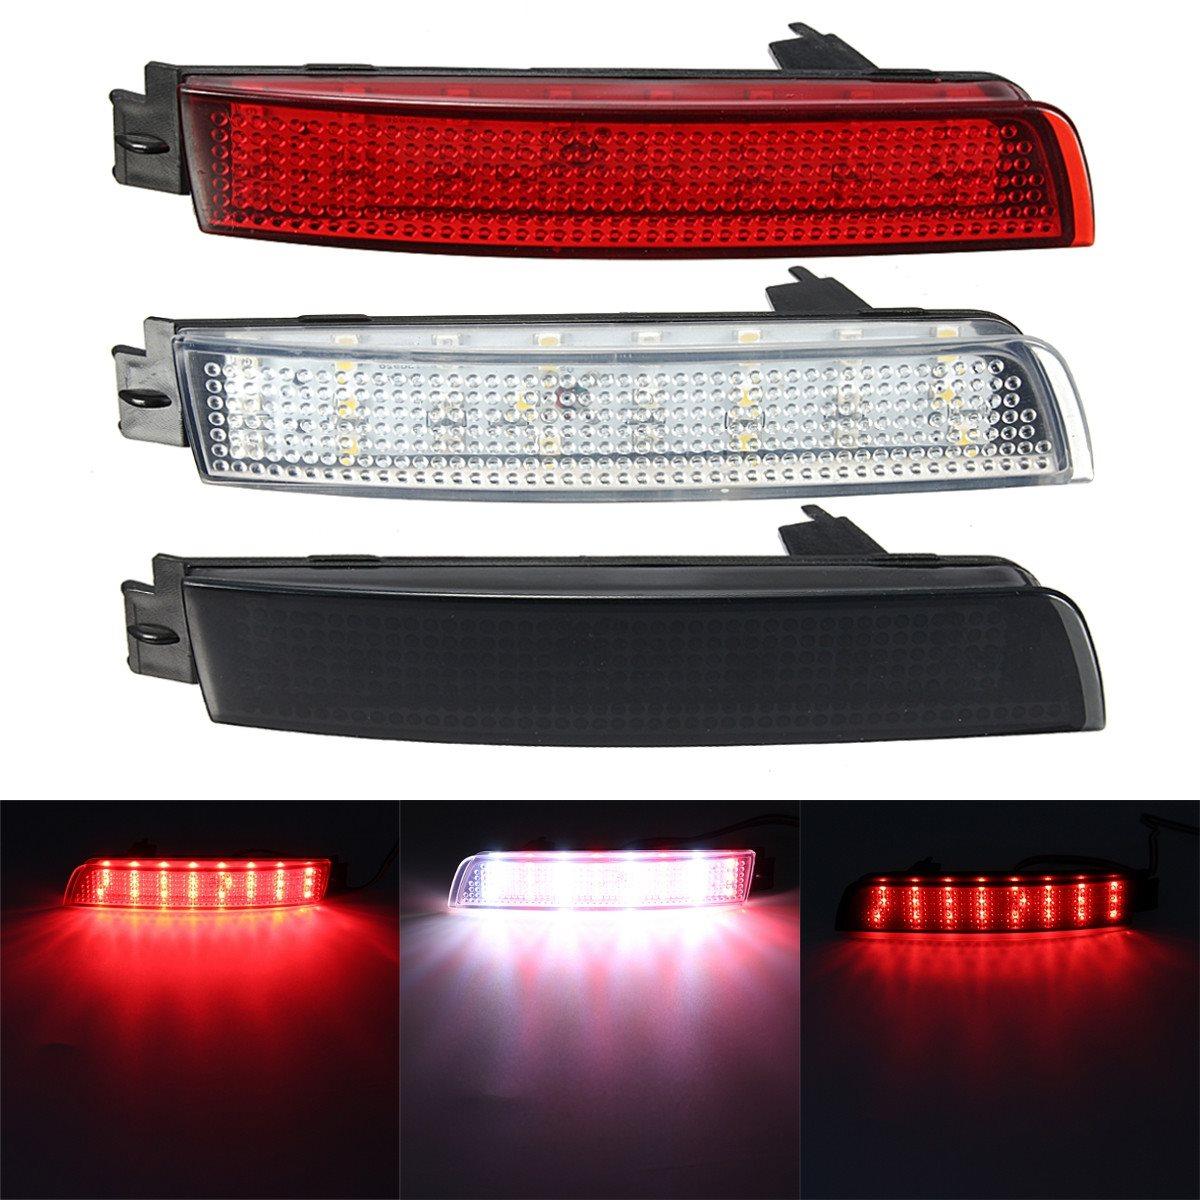 2 unids LED parachoques Reflectores lente roja luz de freno de cola para Nissan Juke/Murano/Infiniti fx35/ fx37/FX50